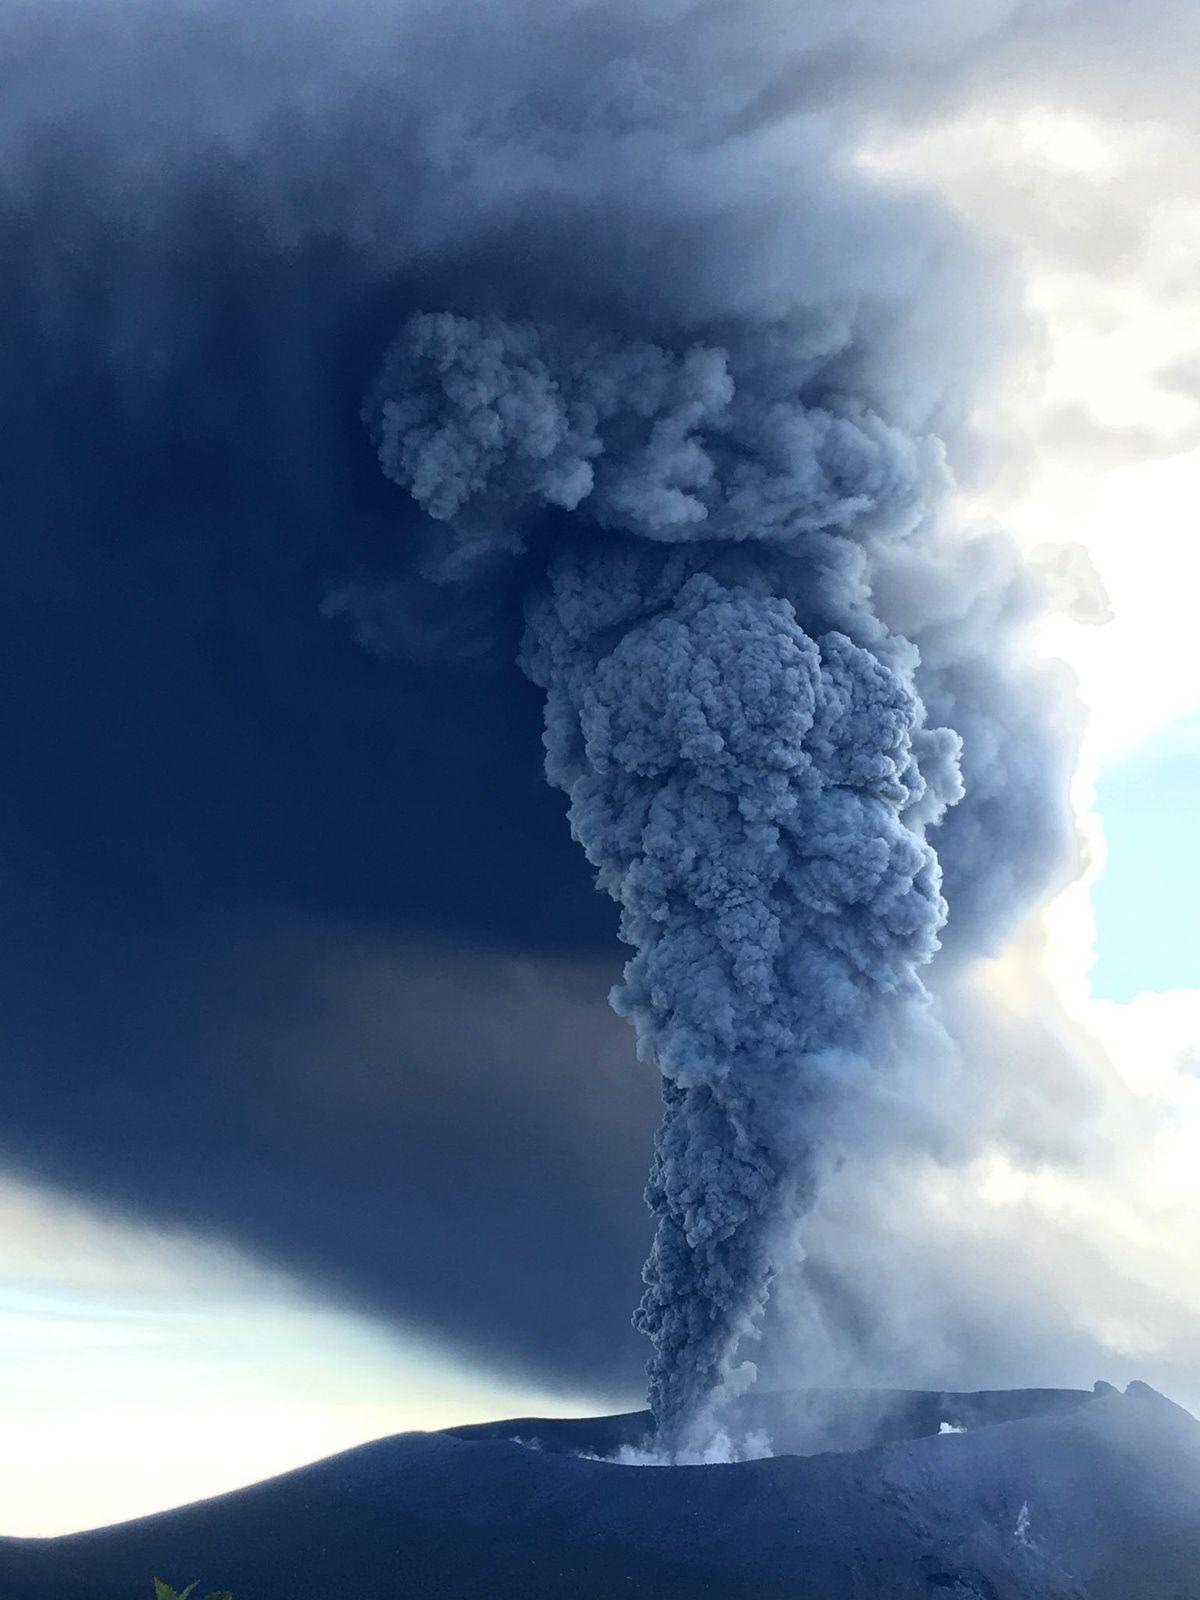 Shinmoedake-Kirishima  - le panache et le nuage chargés en cendres - 12.10.2017 photo  J.Reynolds -  EarthUncutTV